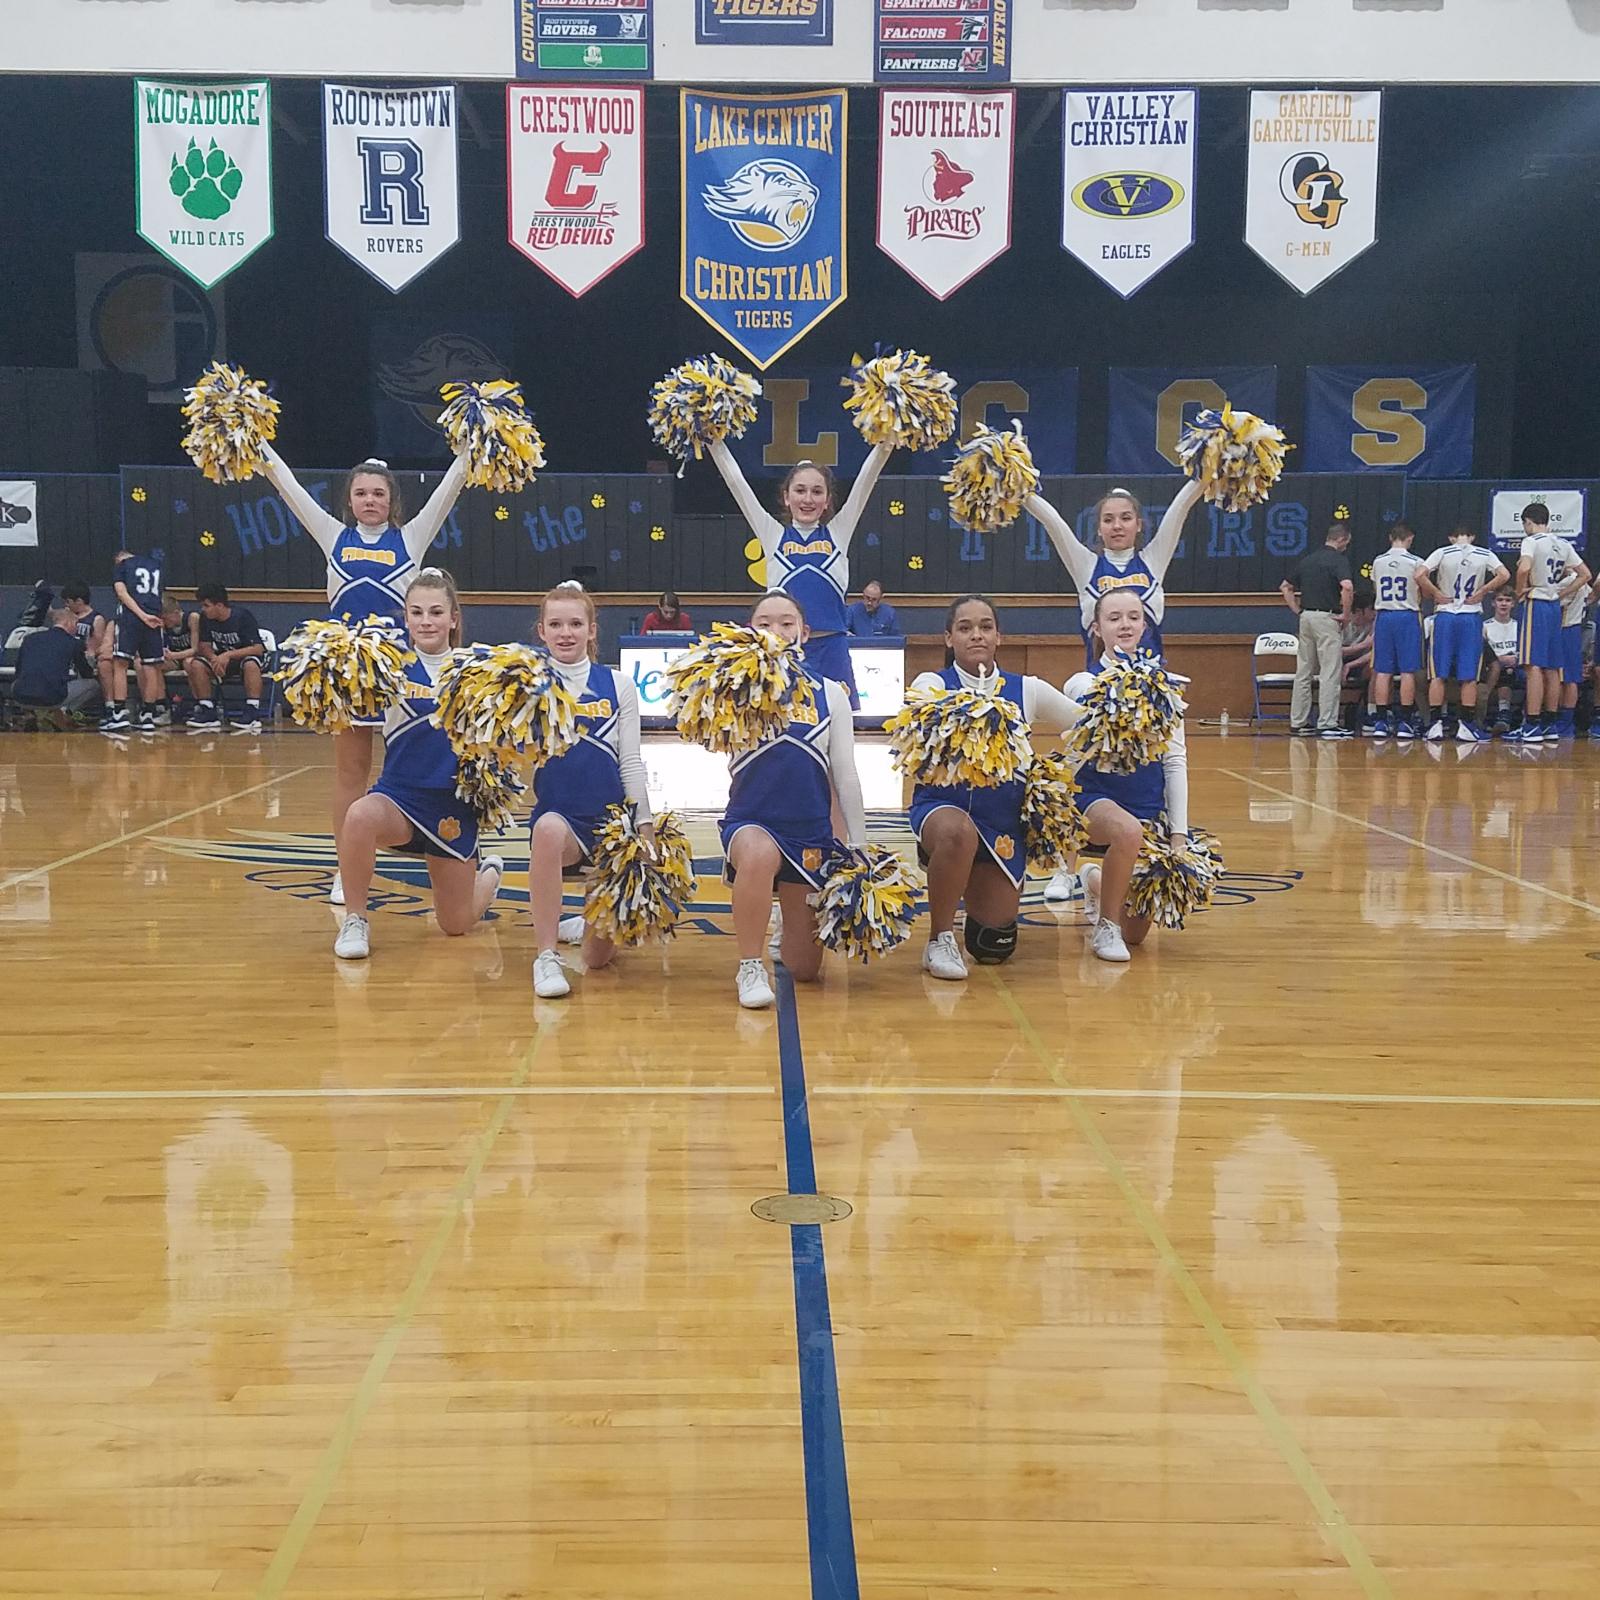 2019-20 Junior High Cheerleading Photos